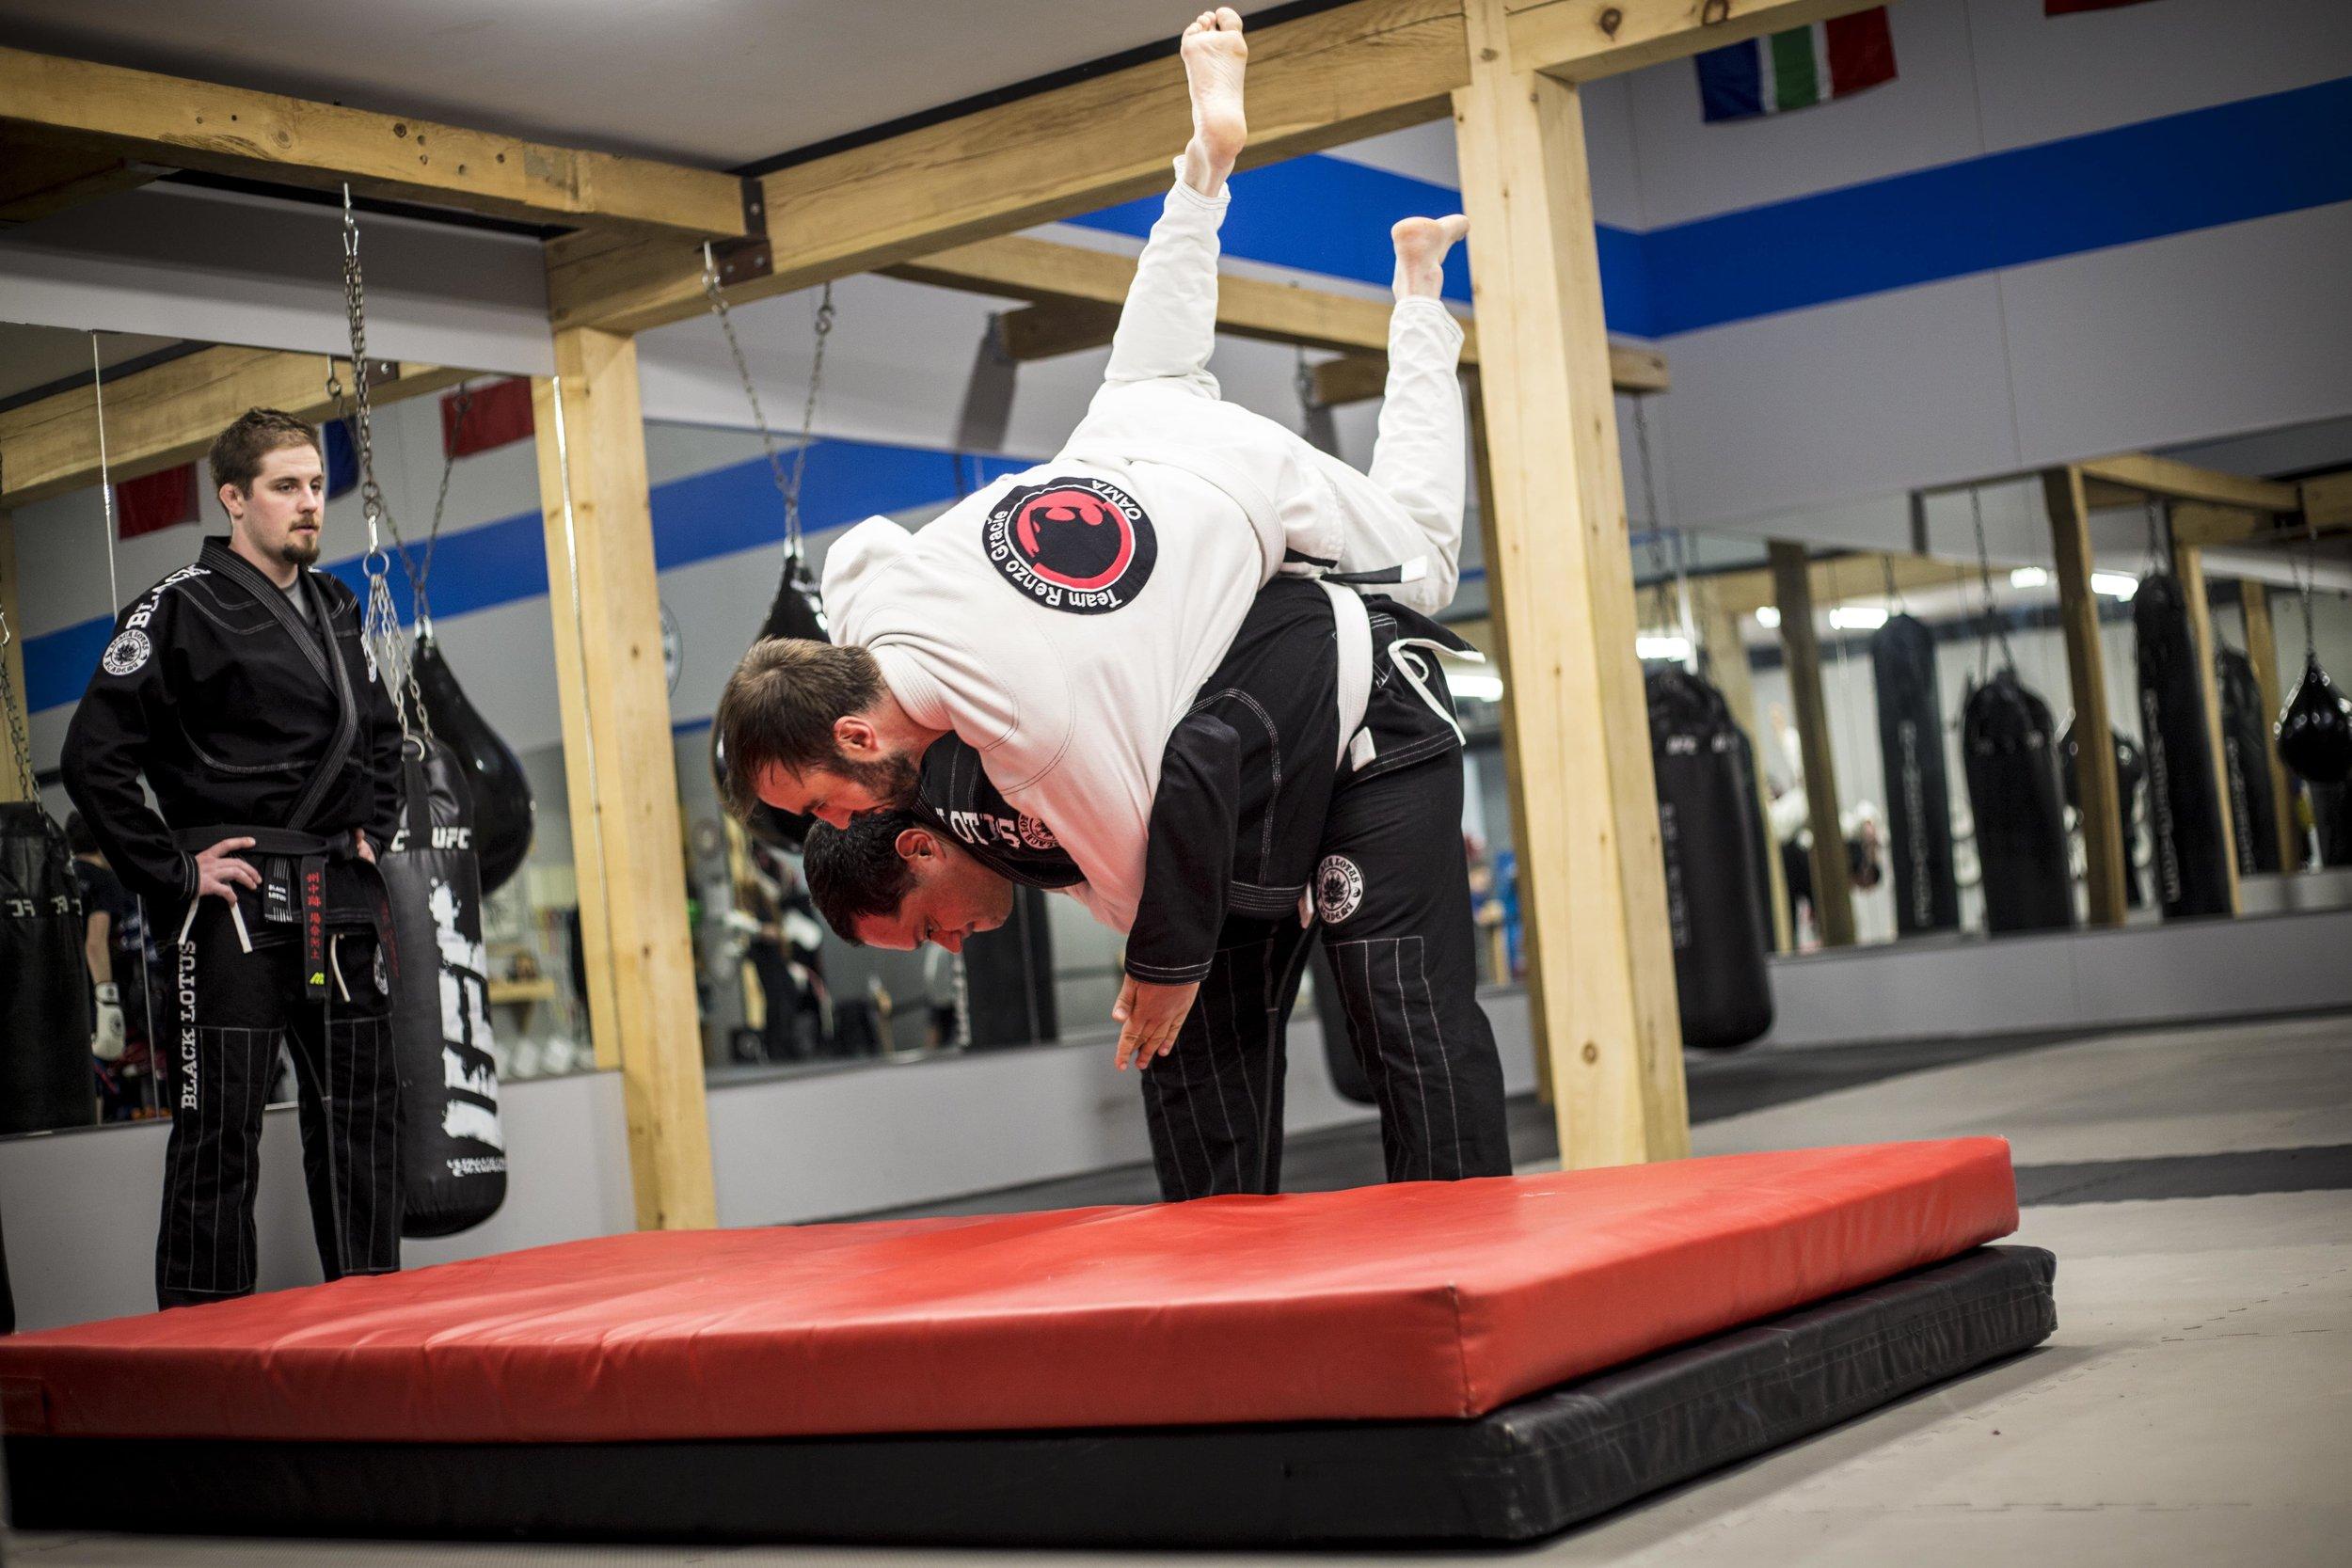 Judo for Adults in Orillia